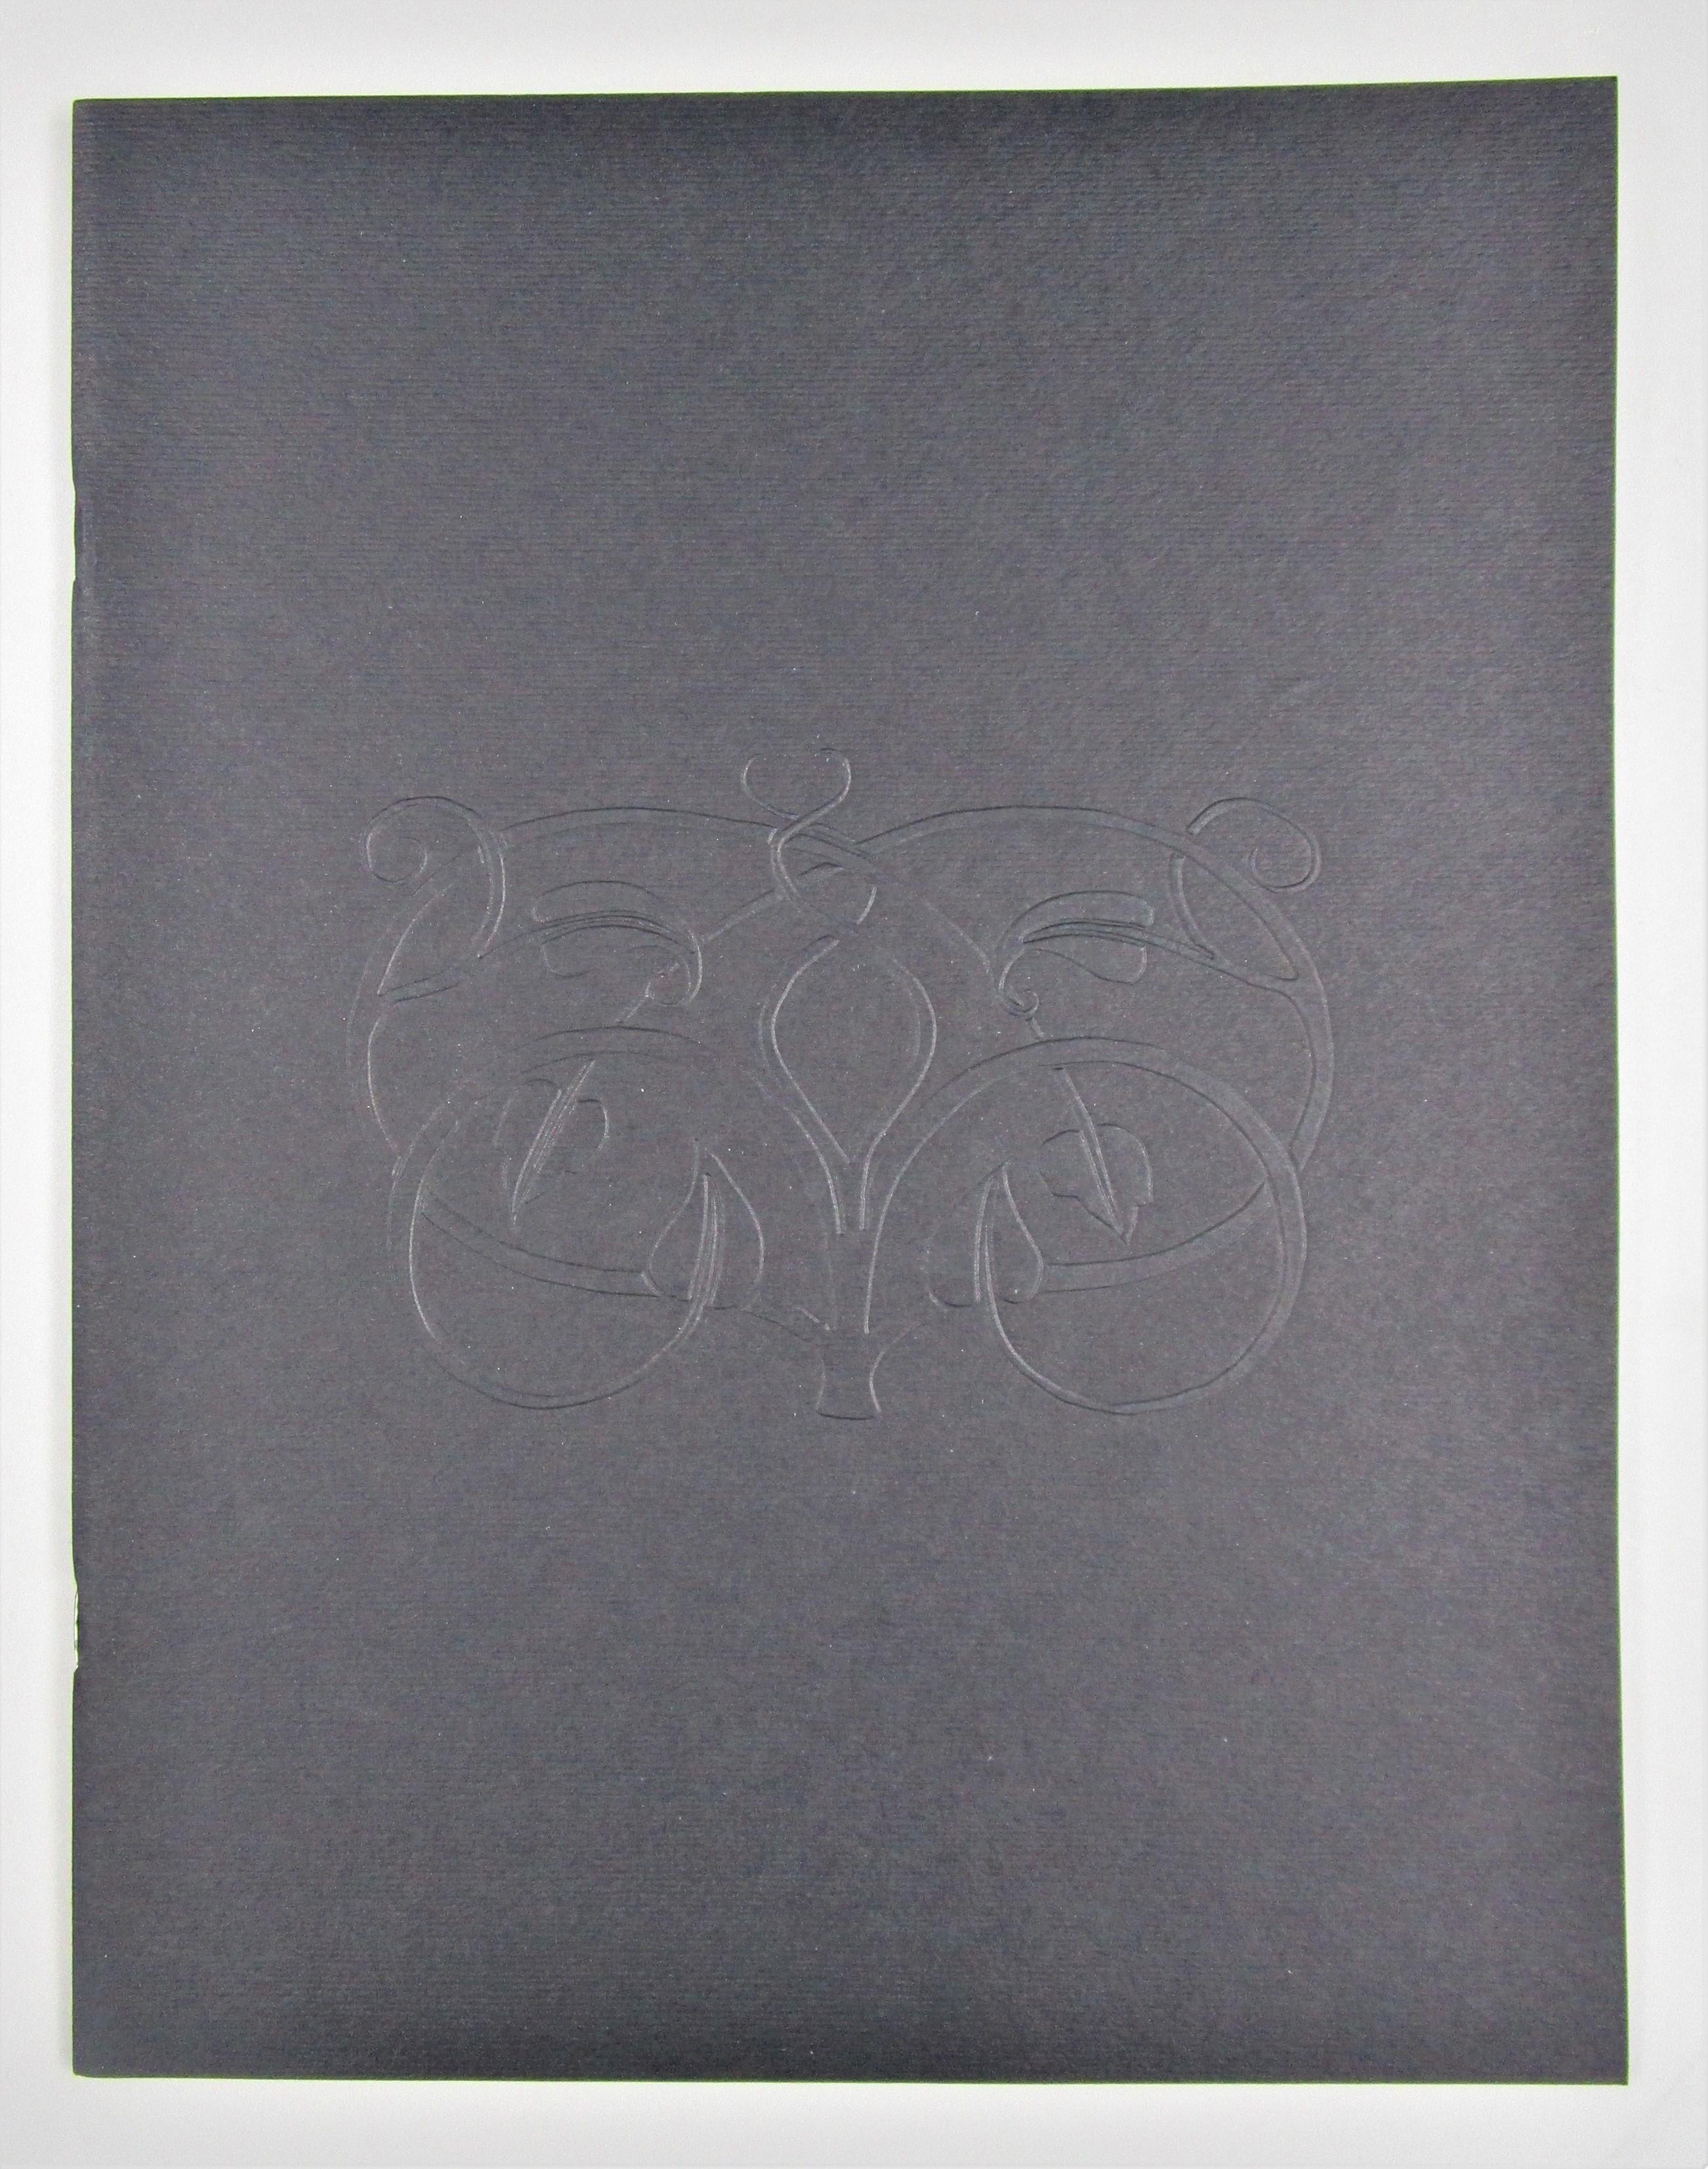 SAMUEL YELLIN METALWORKERS: THREE GENERATIONS - 1998